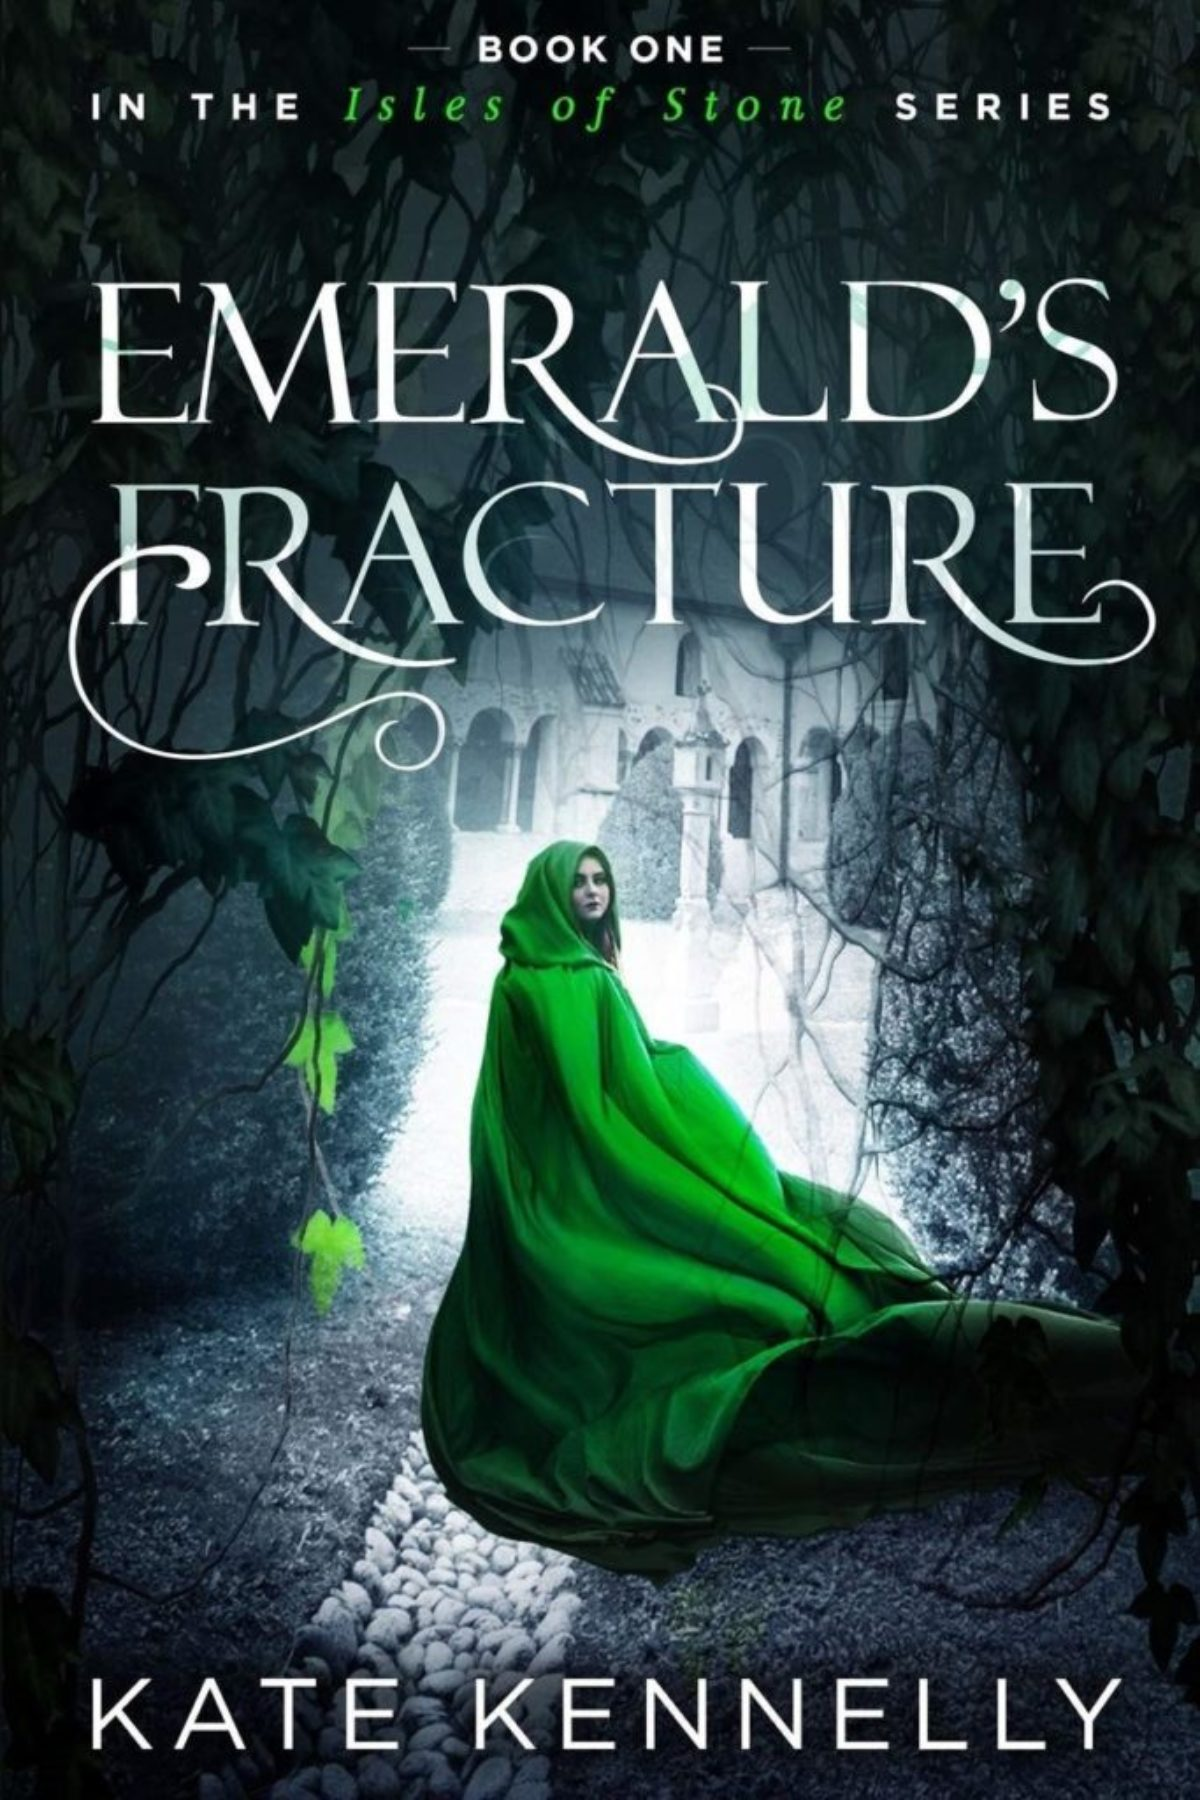 Emerald's Fracture